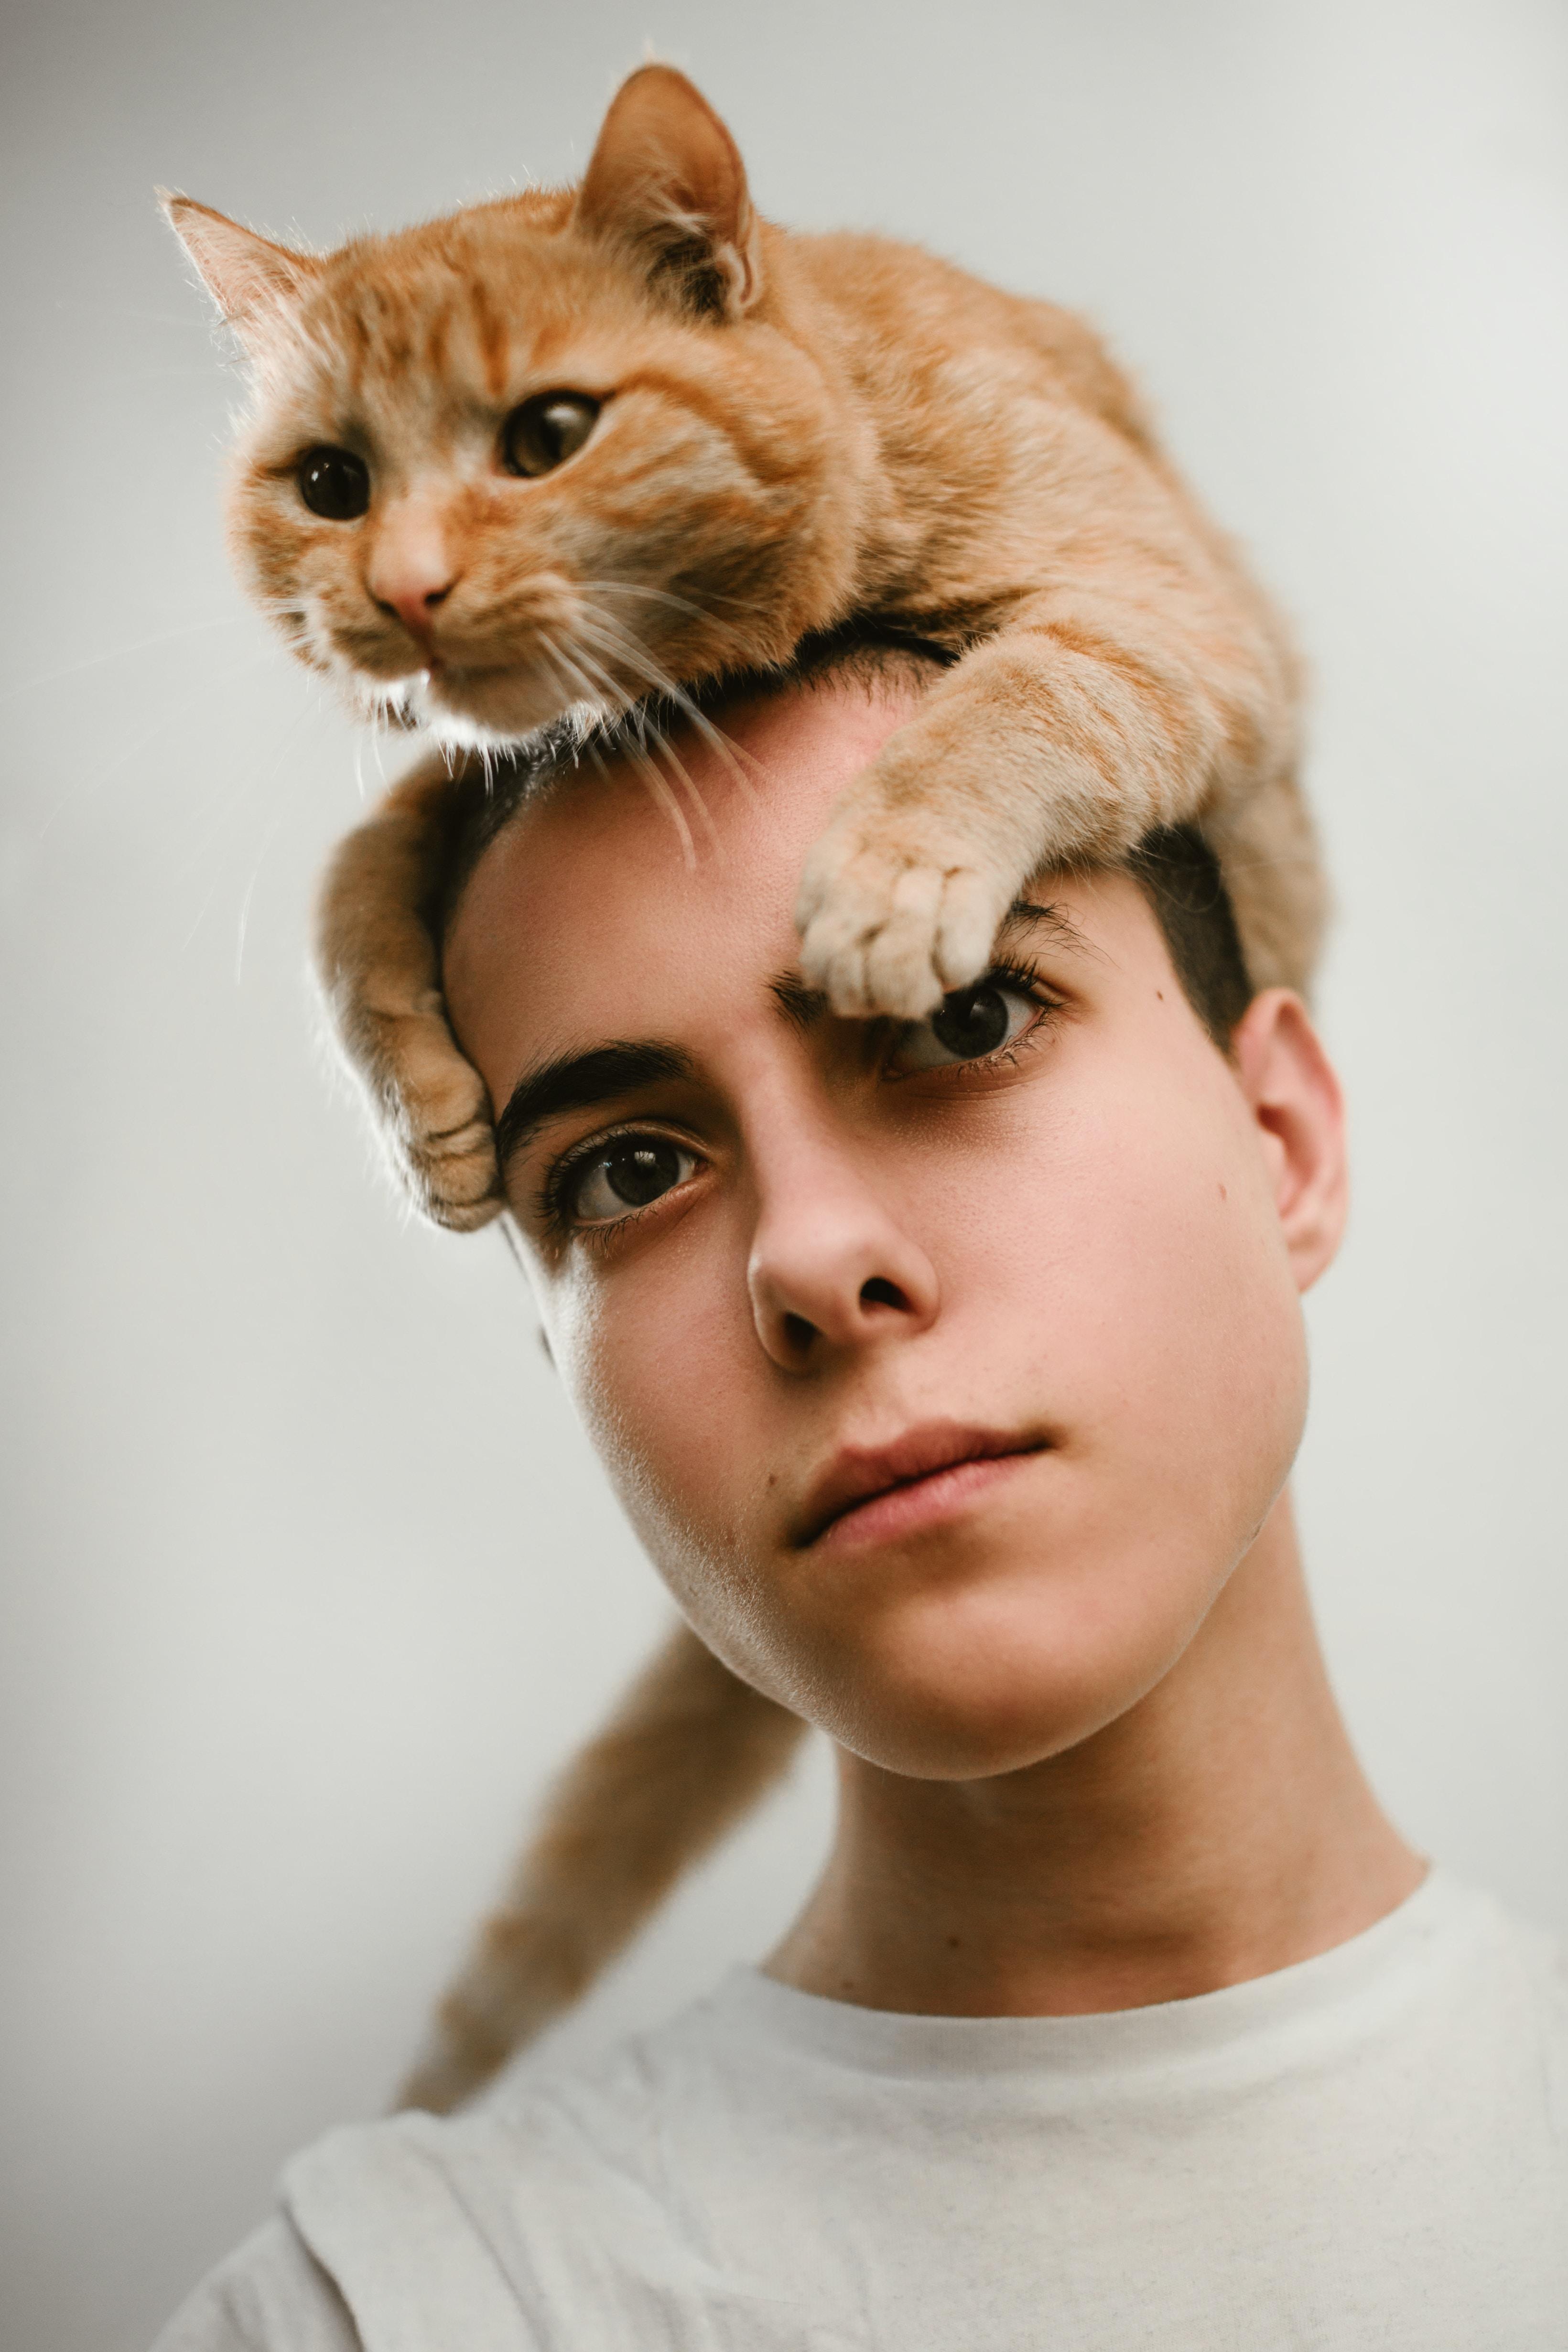 orange cat on head on woman